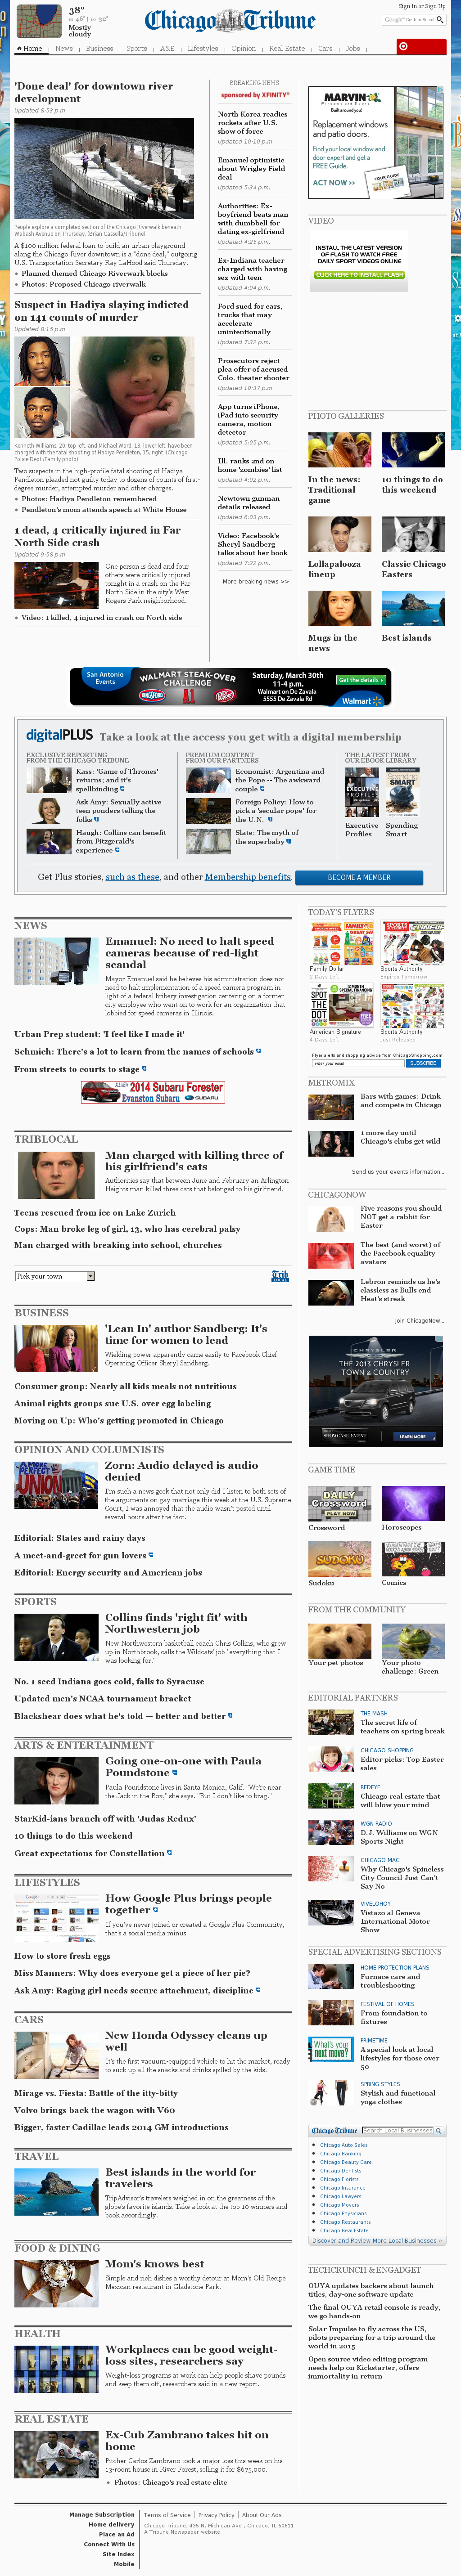 Chicago Tribune at Friday March 29, 2013, 5:03 a.m. UTC